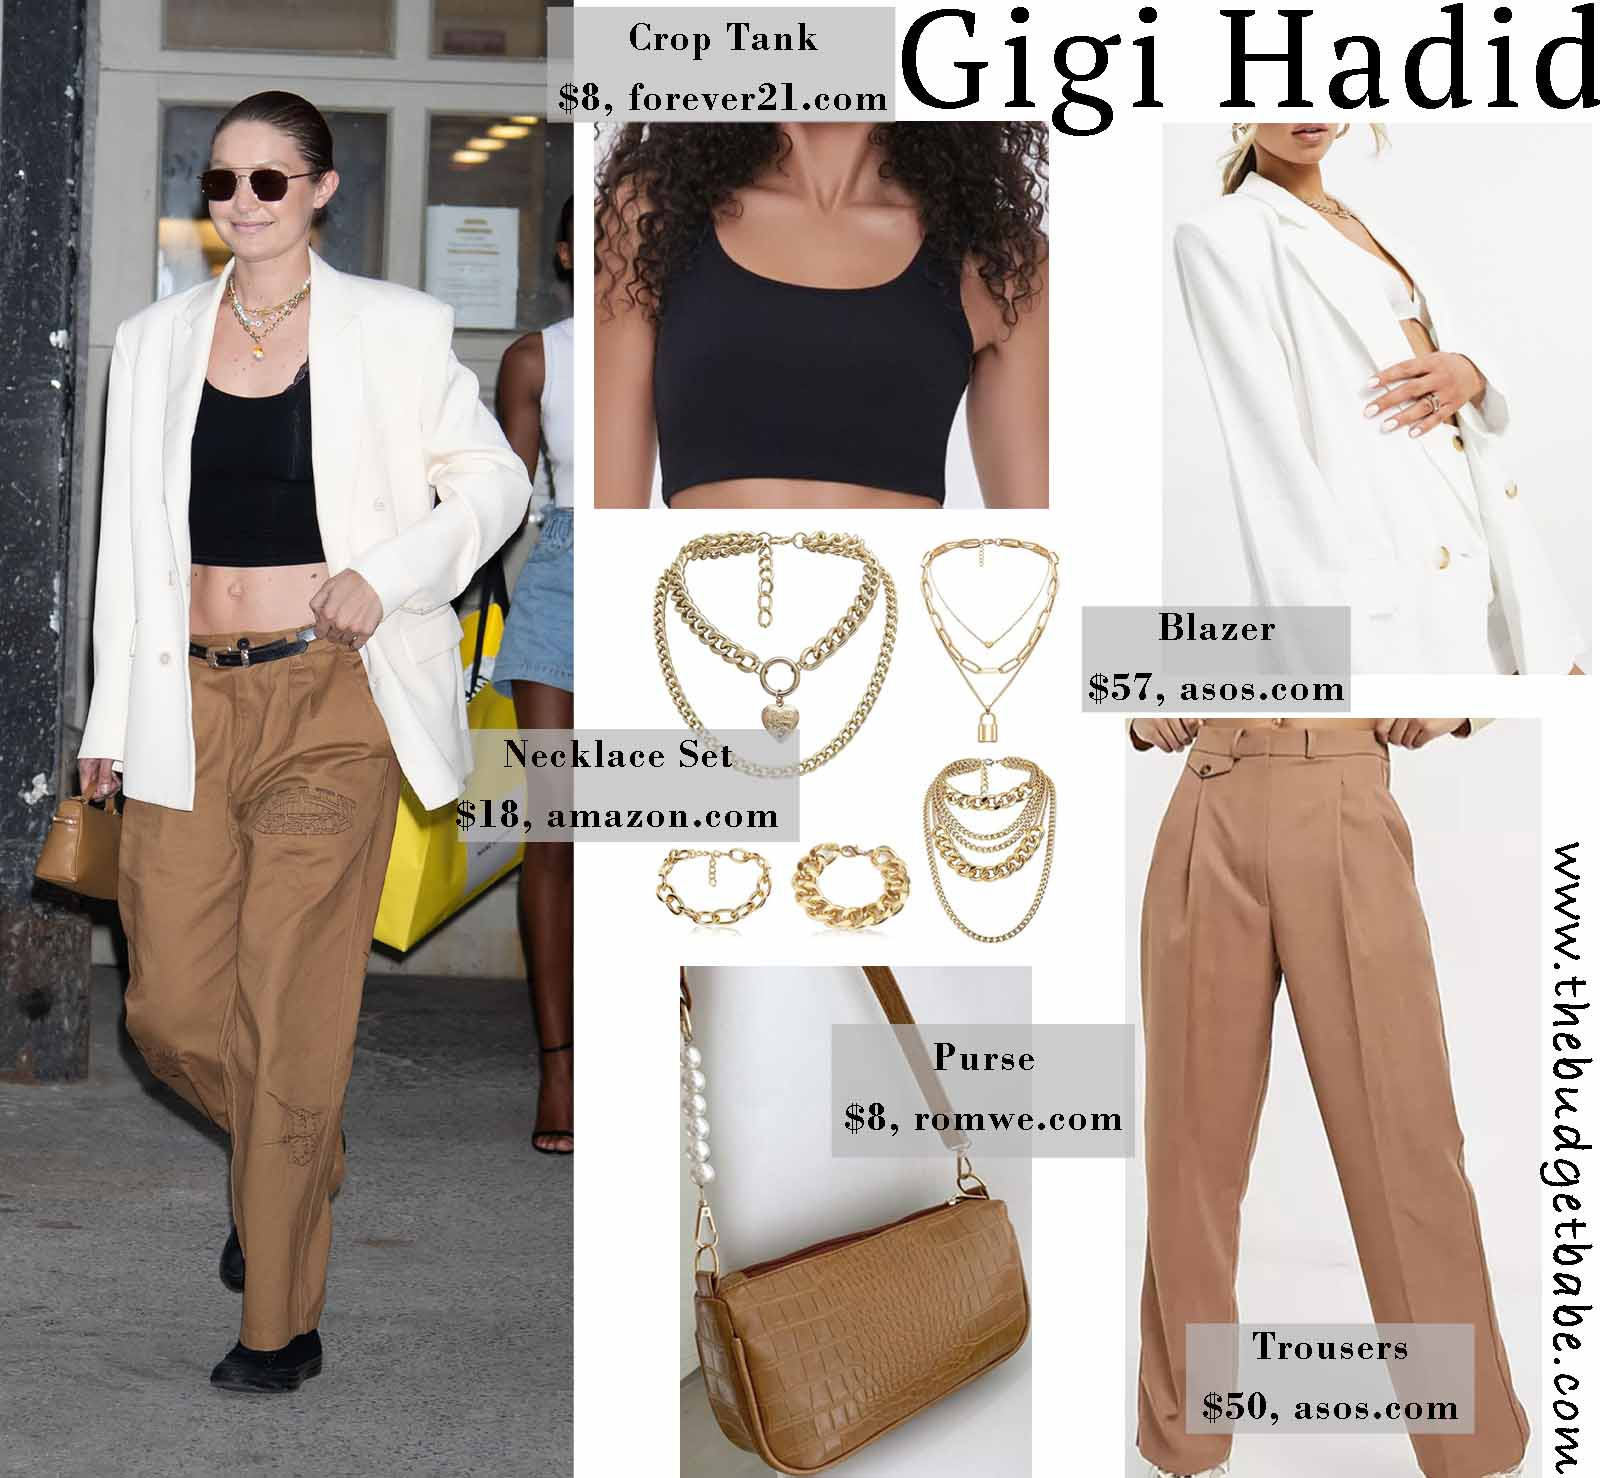 Gigi is so chic in this blazer!